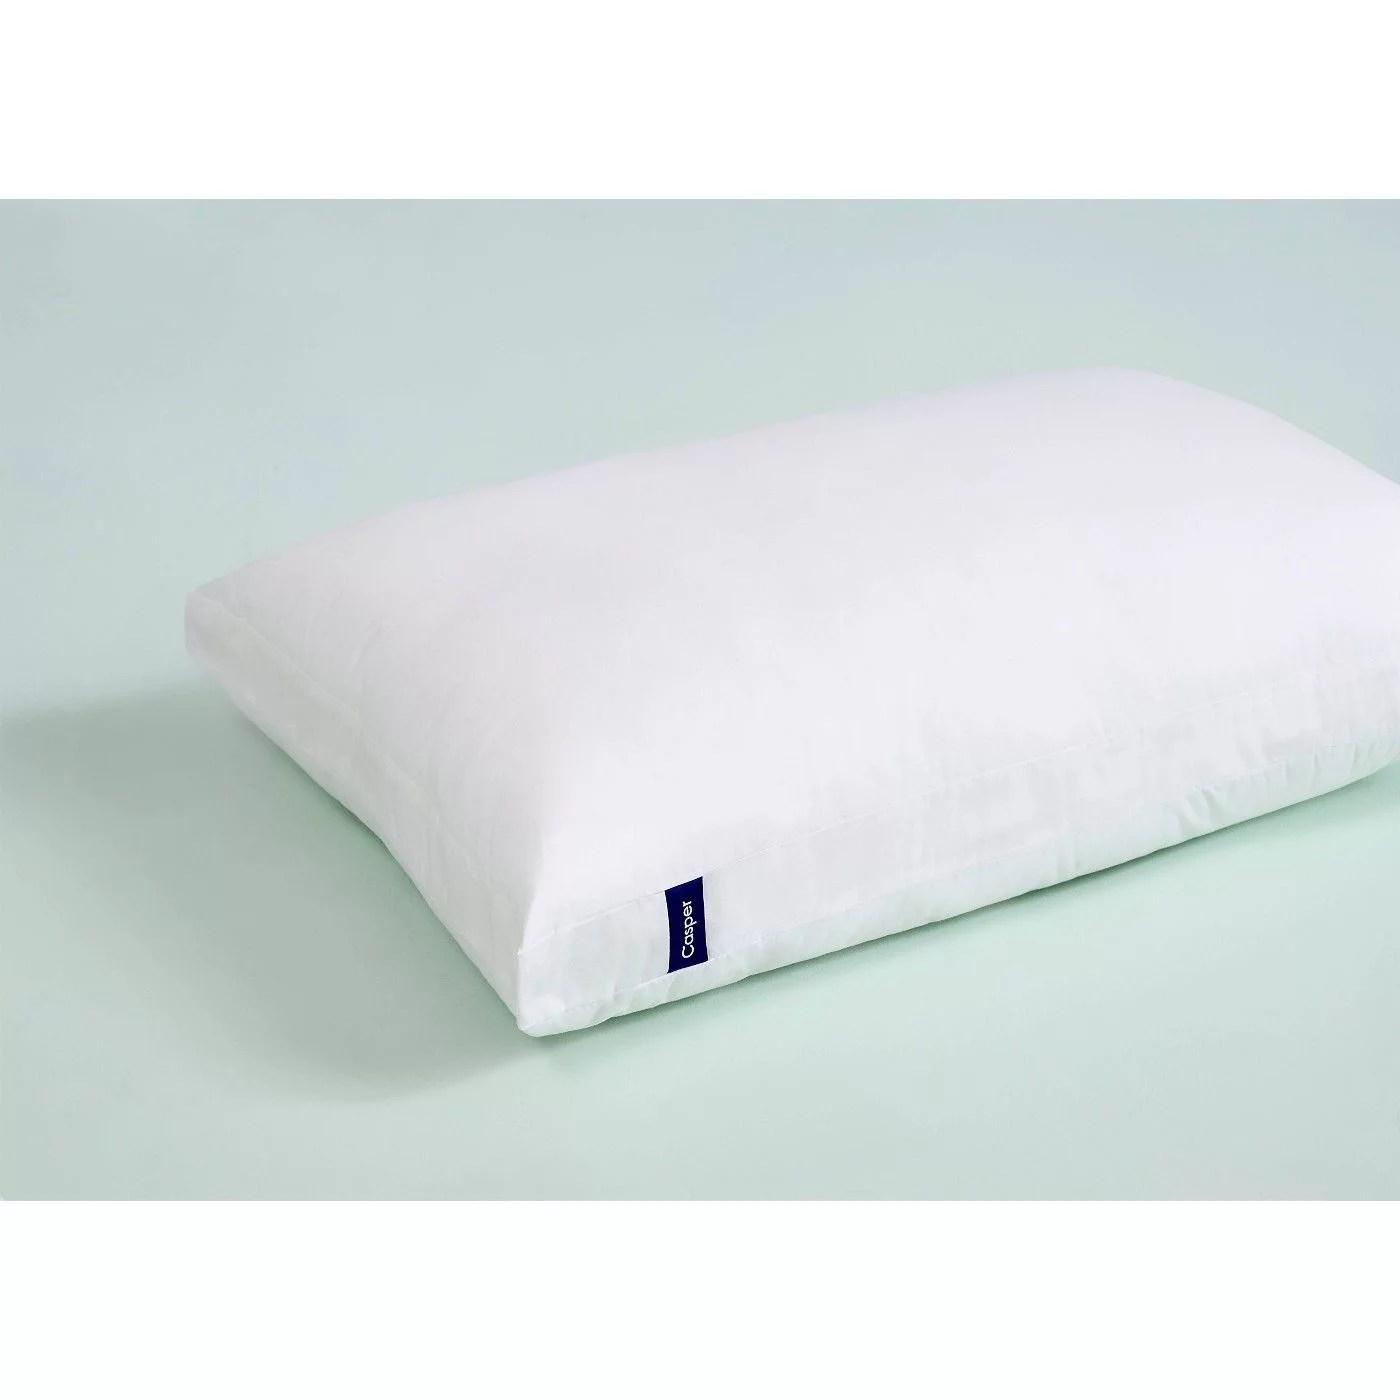 casper sleep pillow dual layer design 100 cotton cover for sleeping king white walmart com